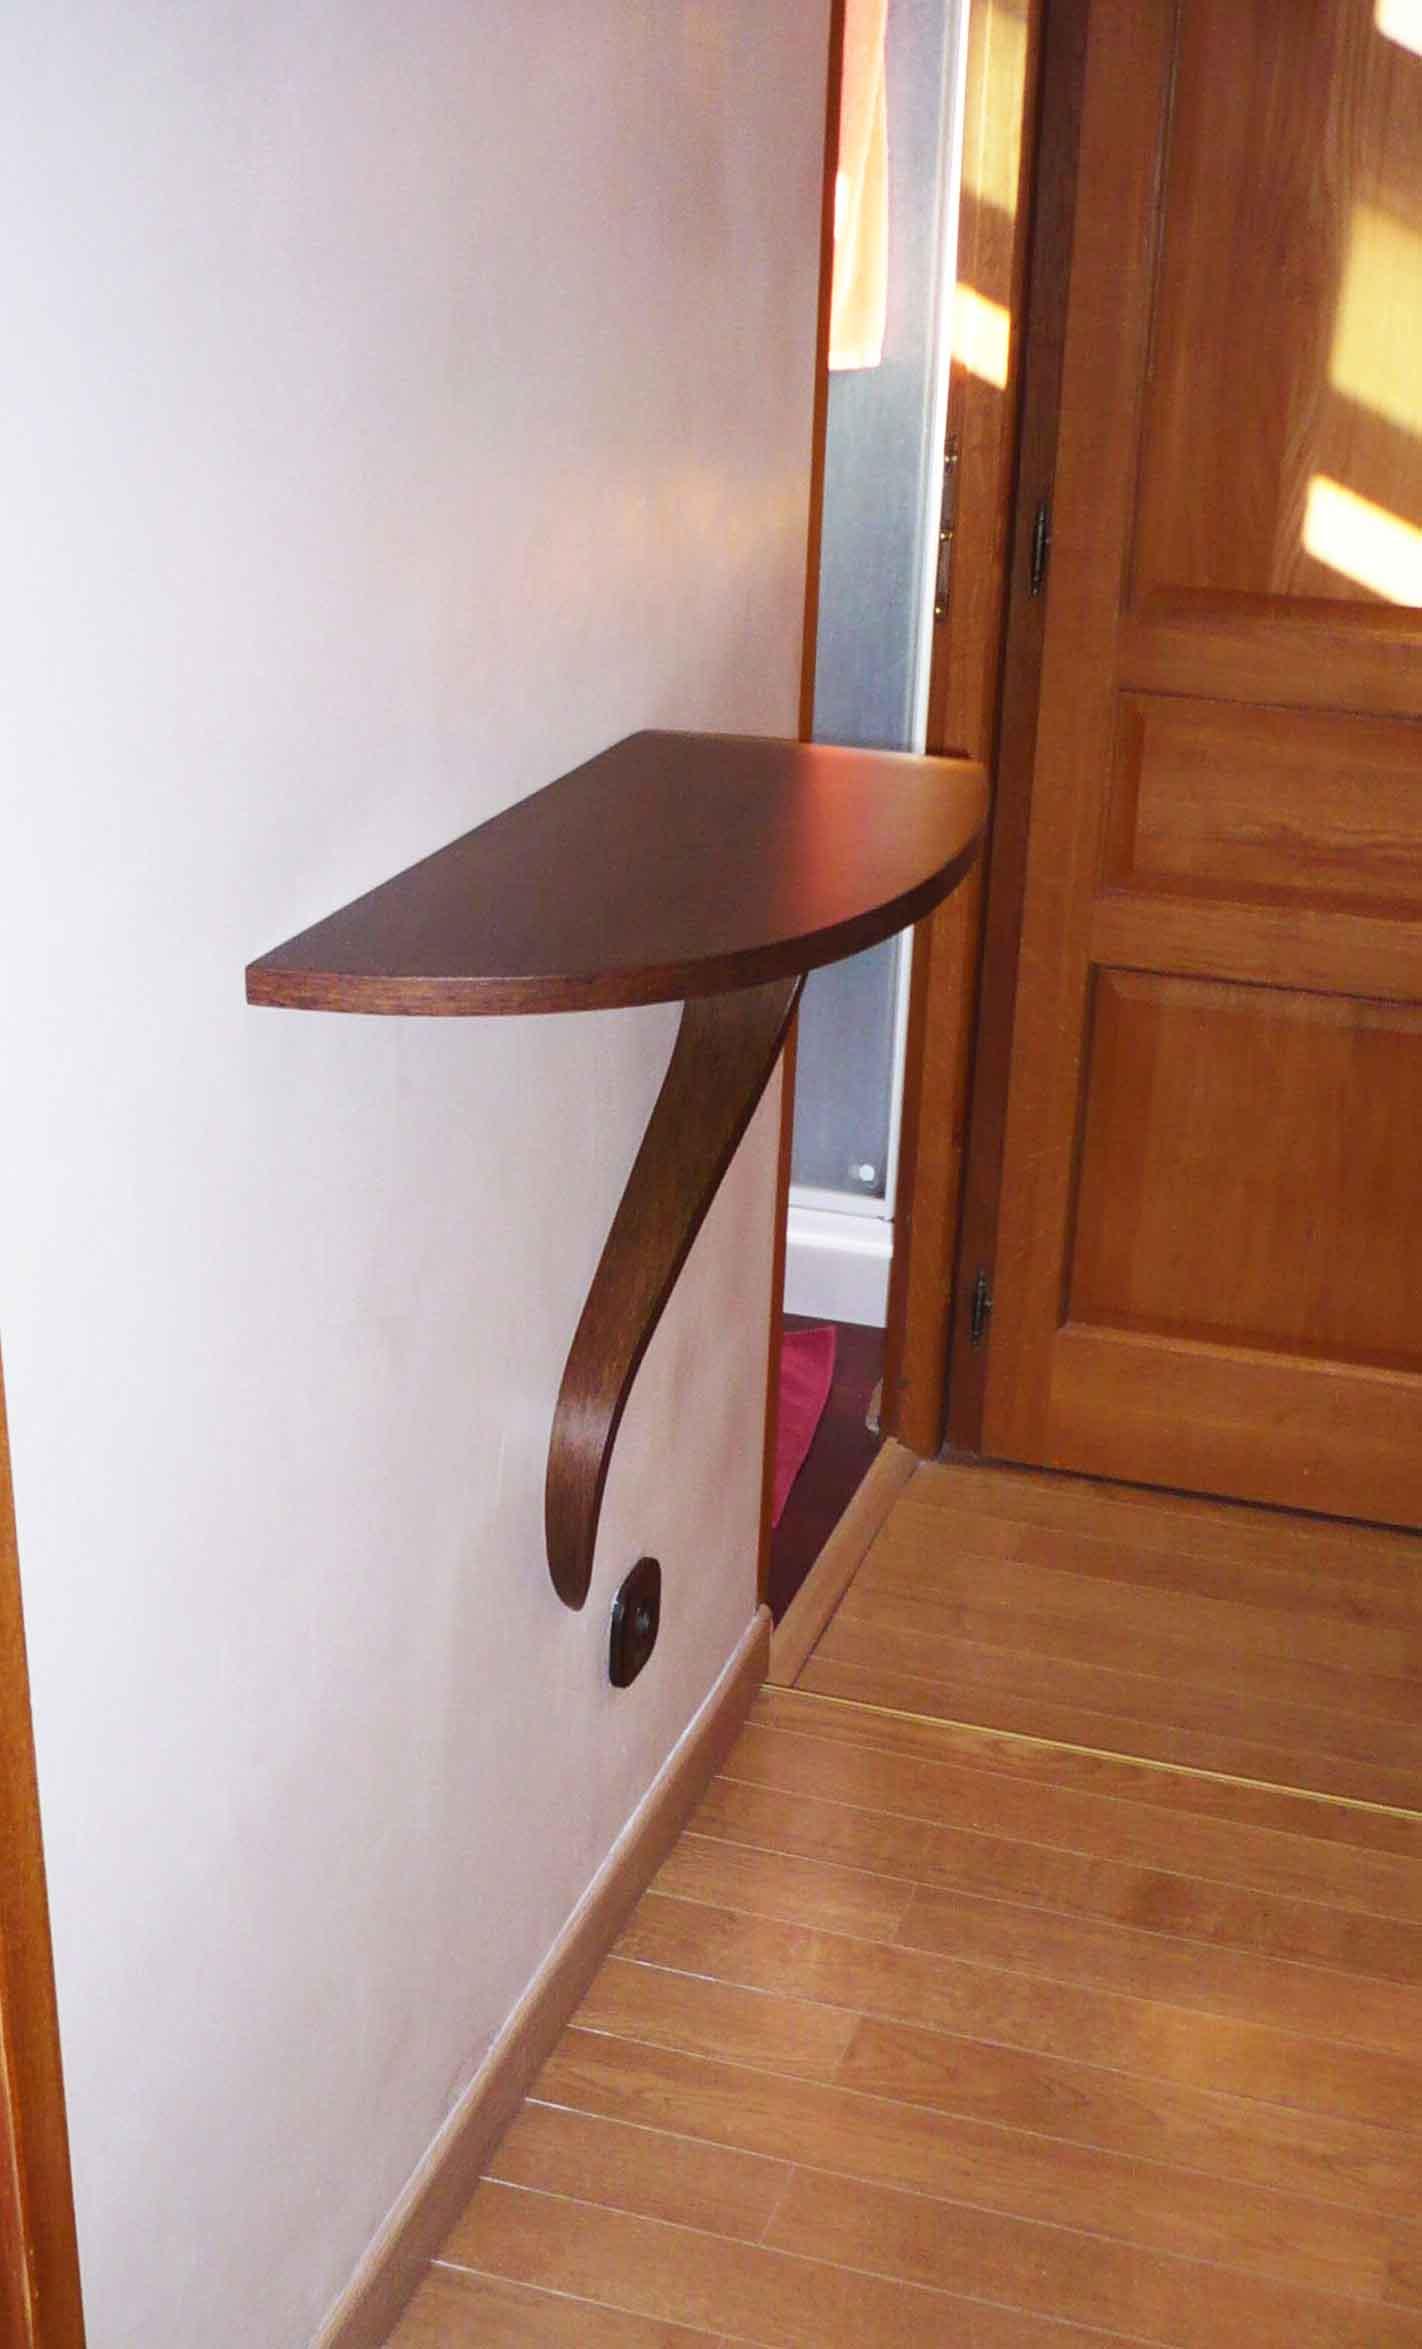 consoles portfolio categories atelier helbecque 94 ile de france paris atelier helbecque. Black Bedroom Furniture Sets. Home Design Ideas